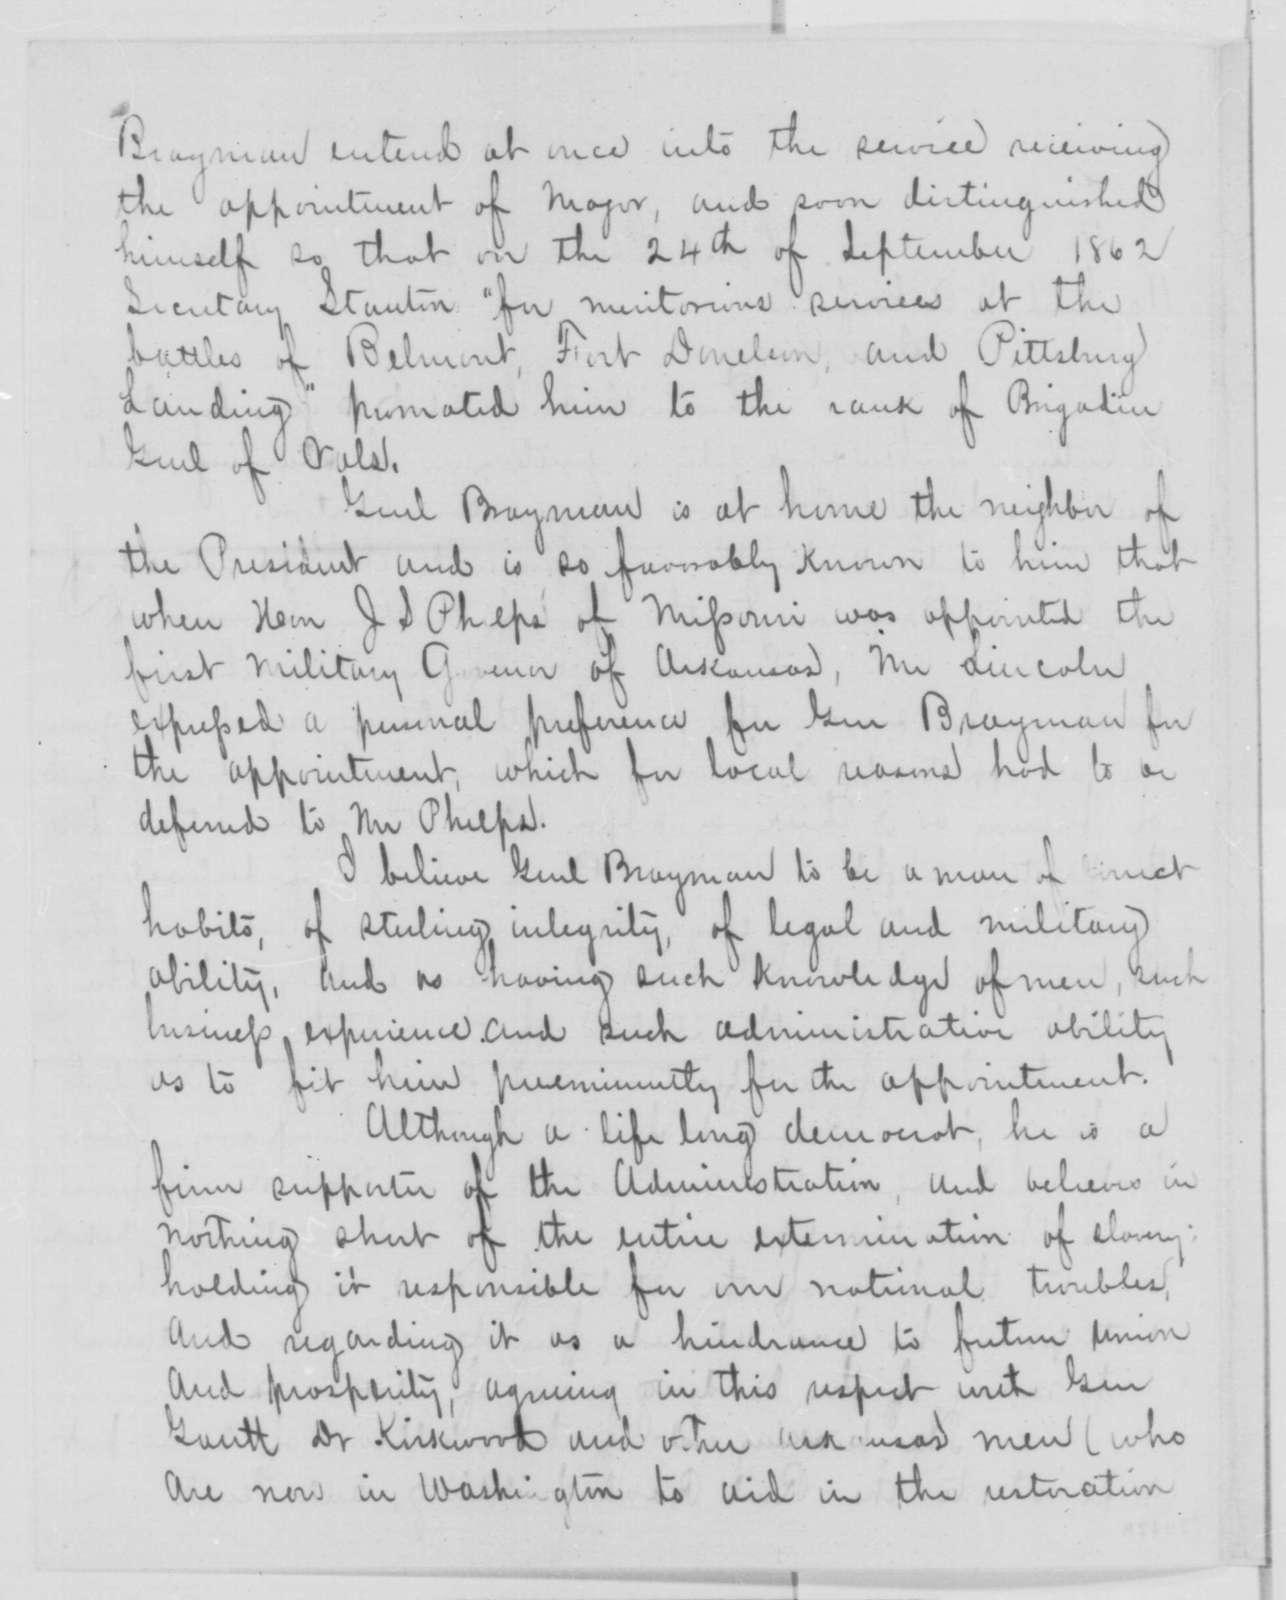 Ralph Plumb to James A. Garfield, Thursday, January 14, 1864  (Introduction)